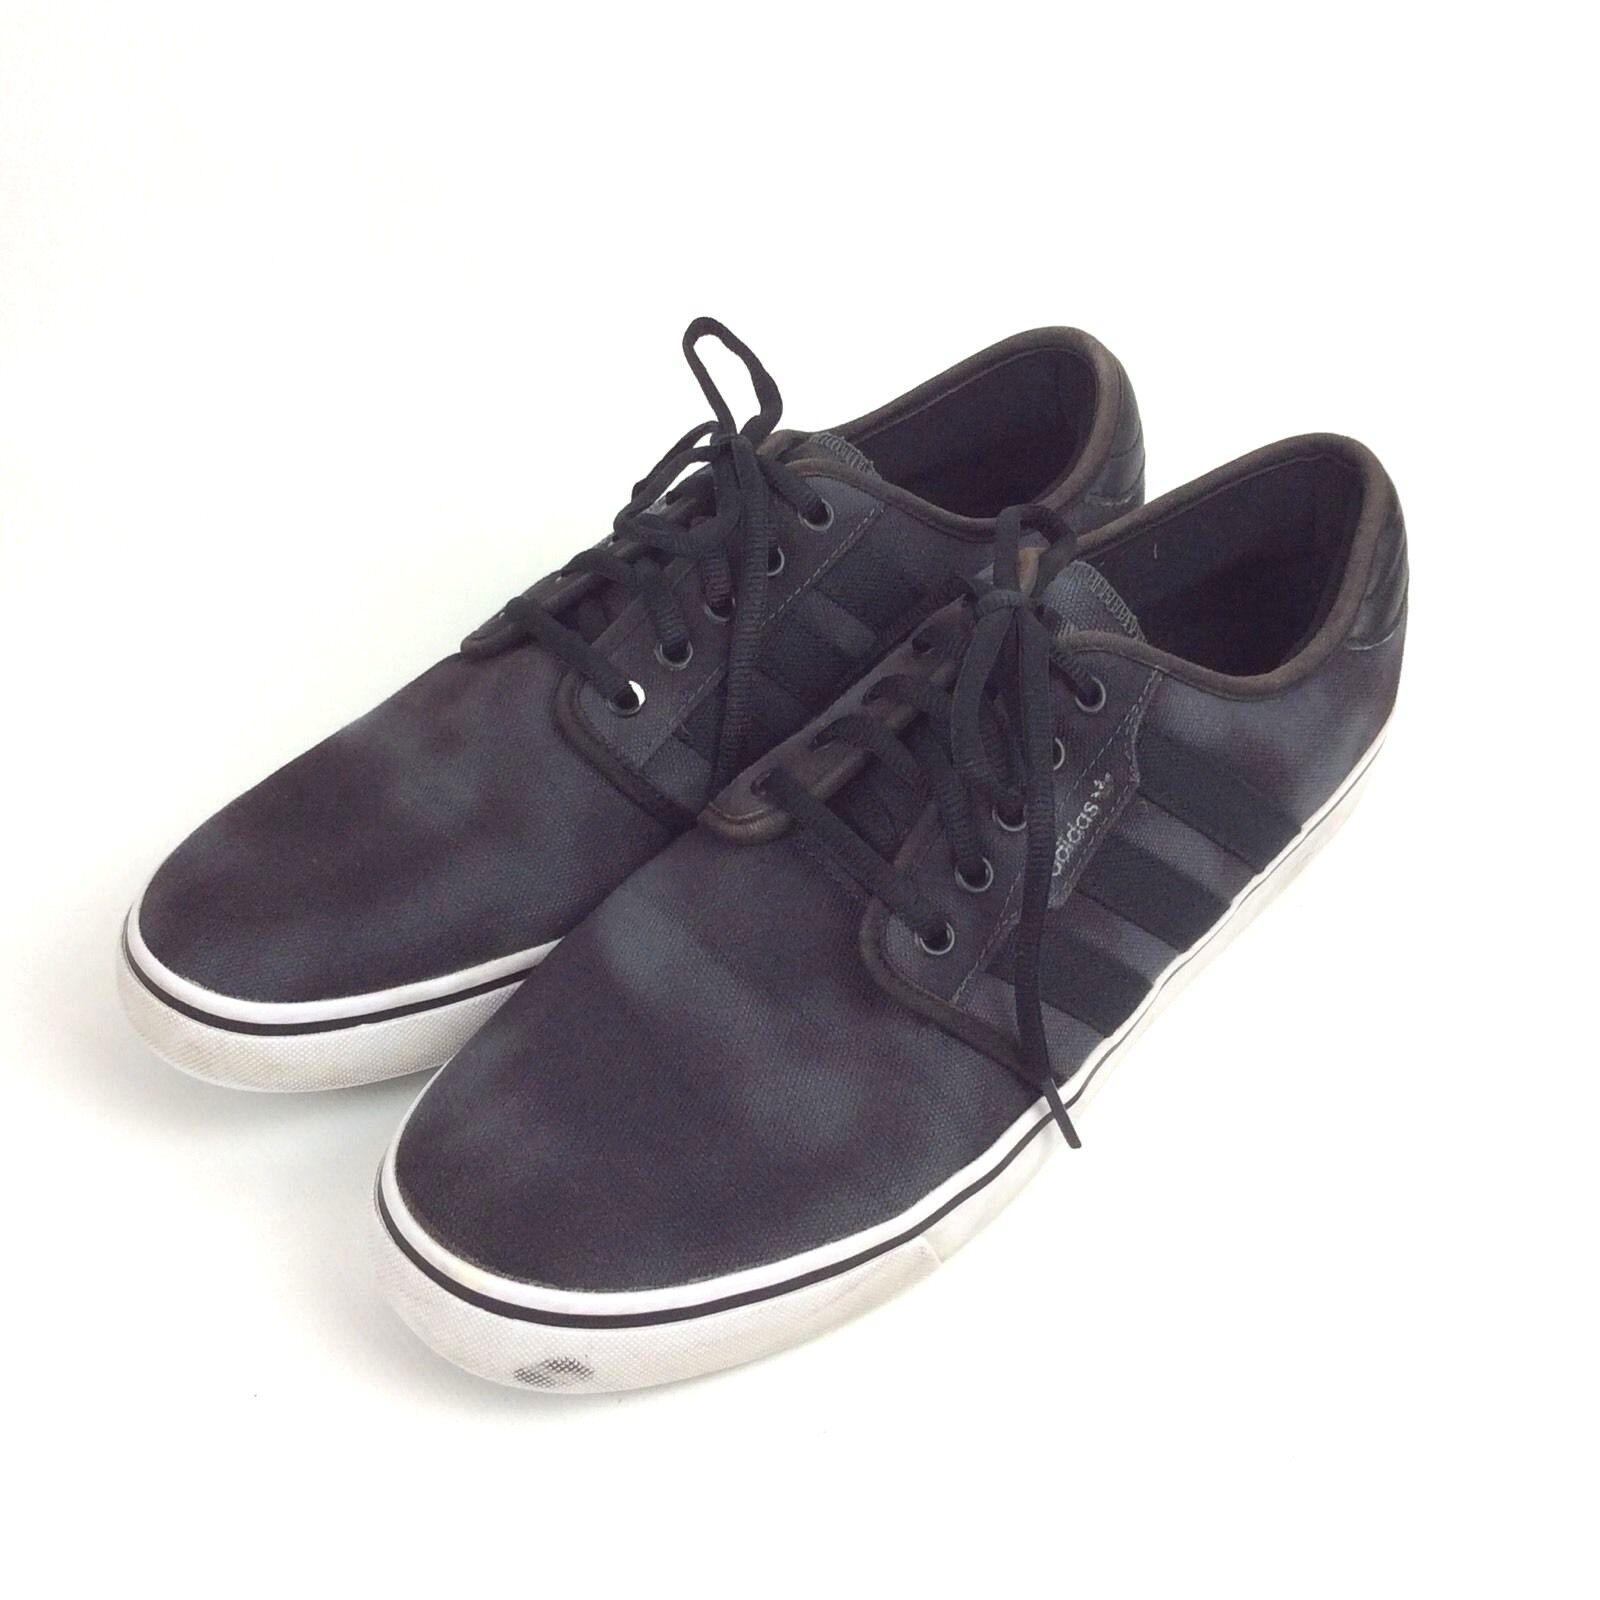 Adidas Eddie Van Halen Sneakers Sz 10.5 Black Gray Canvas EVH 791004 ART C76311 The most popular shoes for men and women